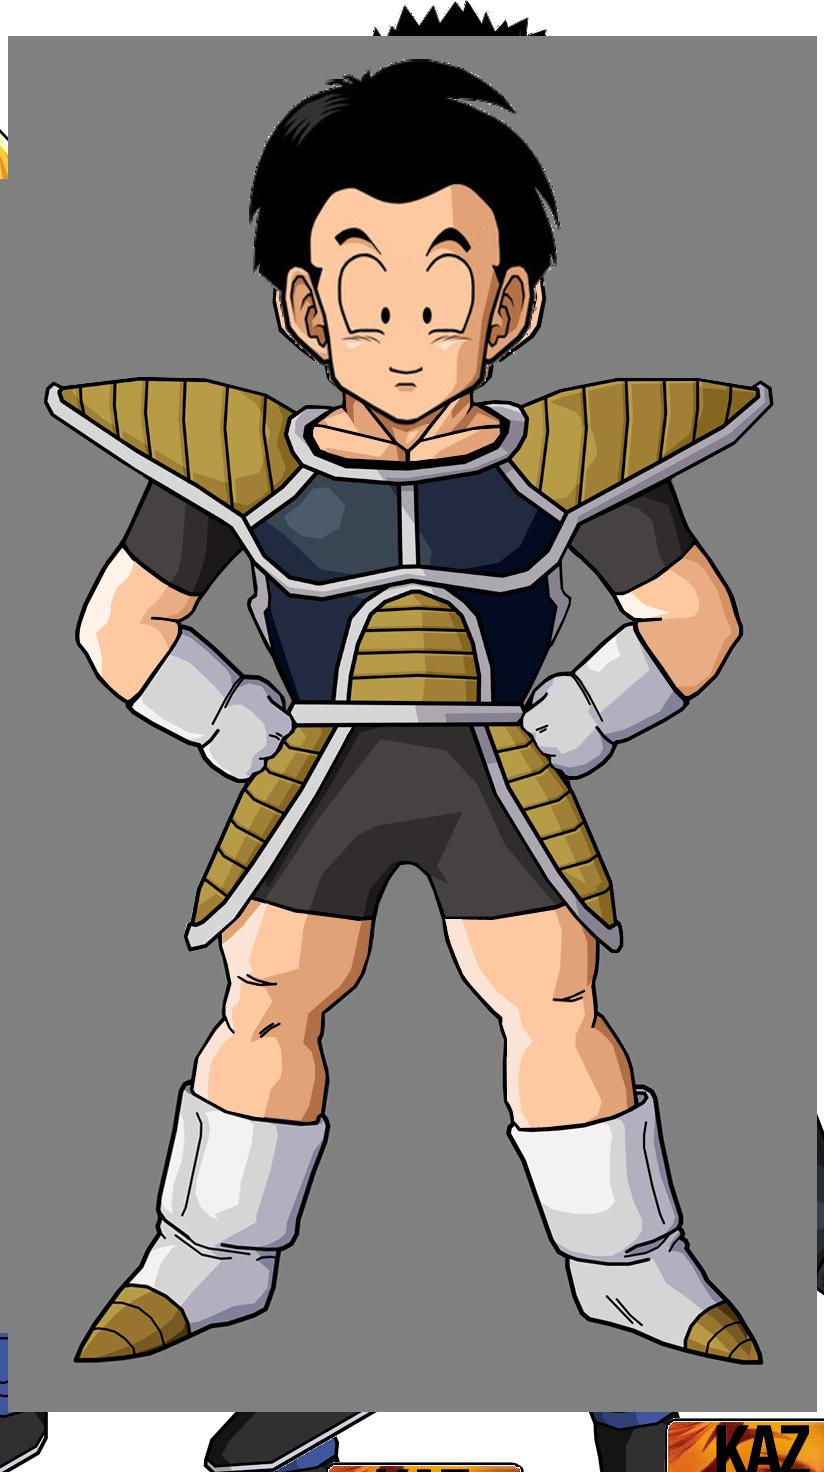 Krillin Saiyan Armor With Hair By Robertovile On Deviantart